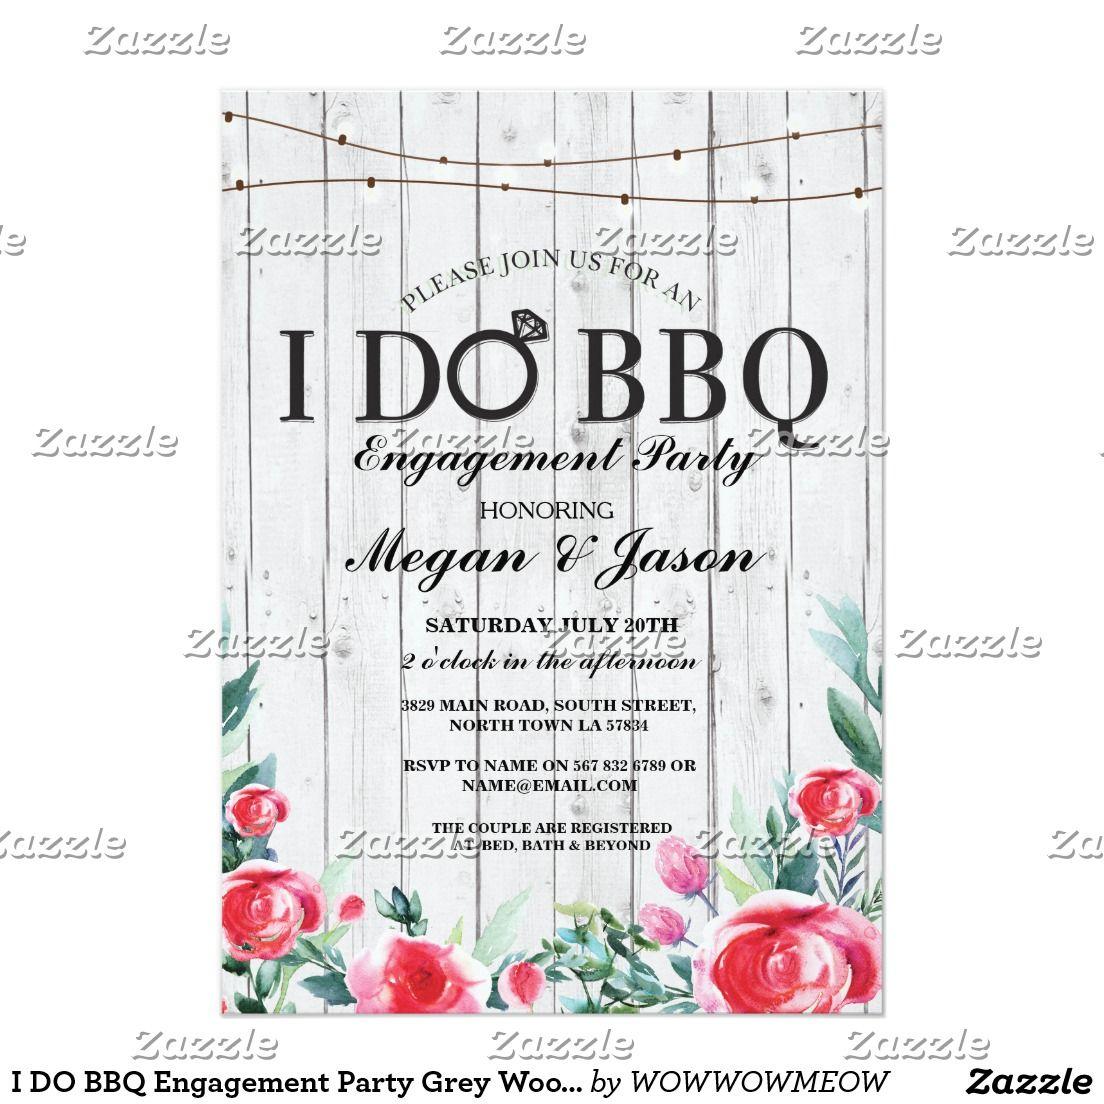 I DO BBQ Engagement Party Grey Wood Invitation